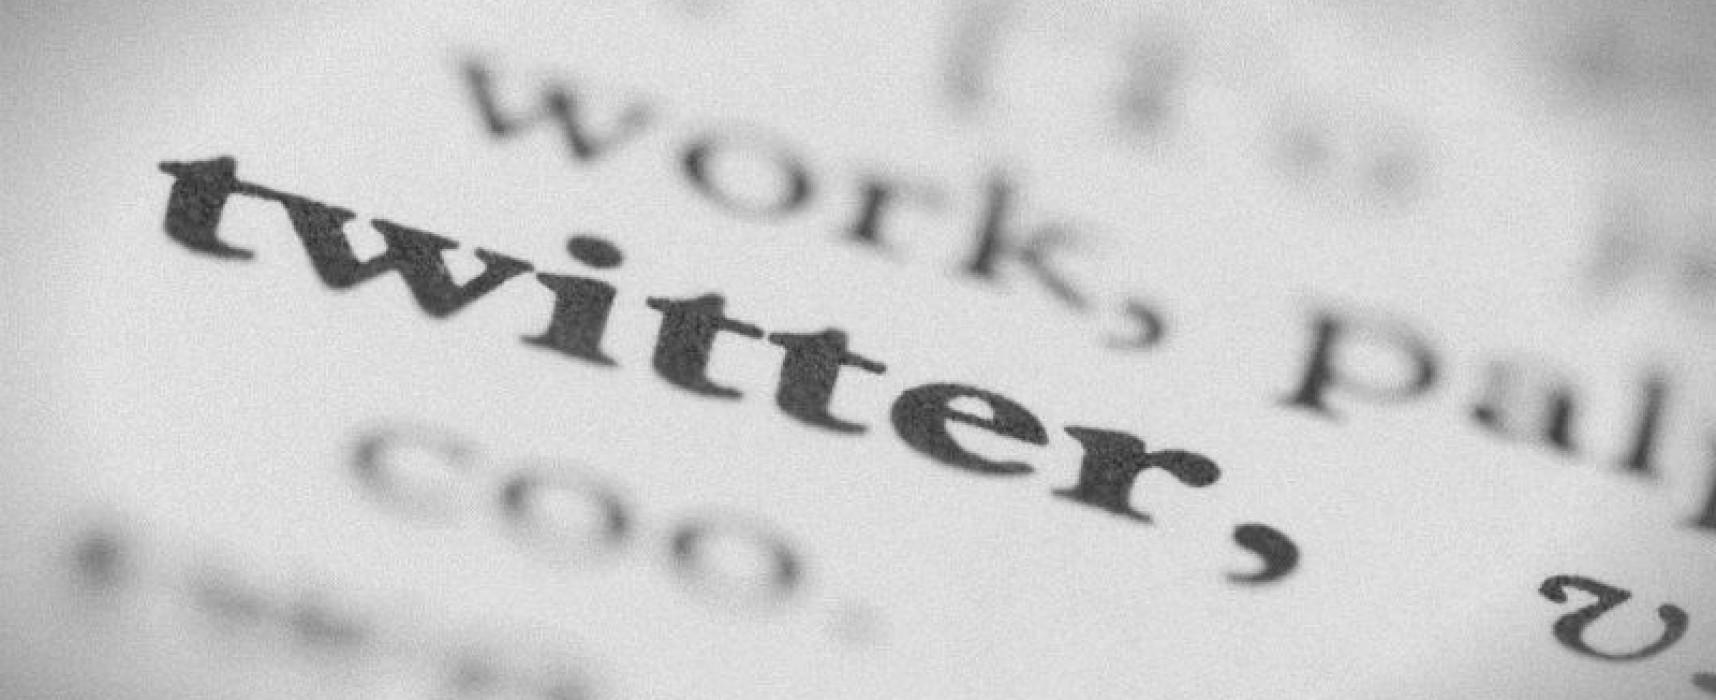 Twitter Chatter About Putin and Poroshenko: The Language Breakdown